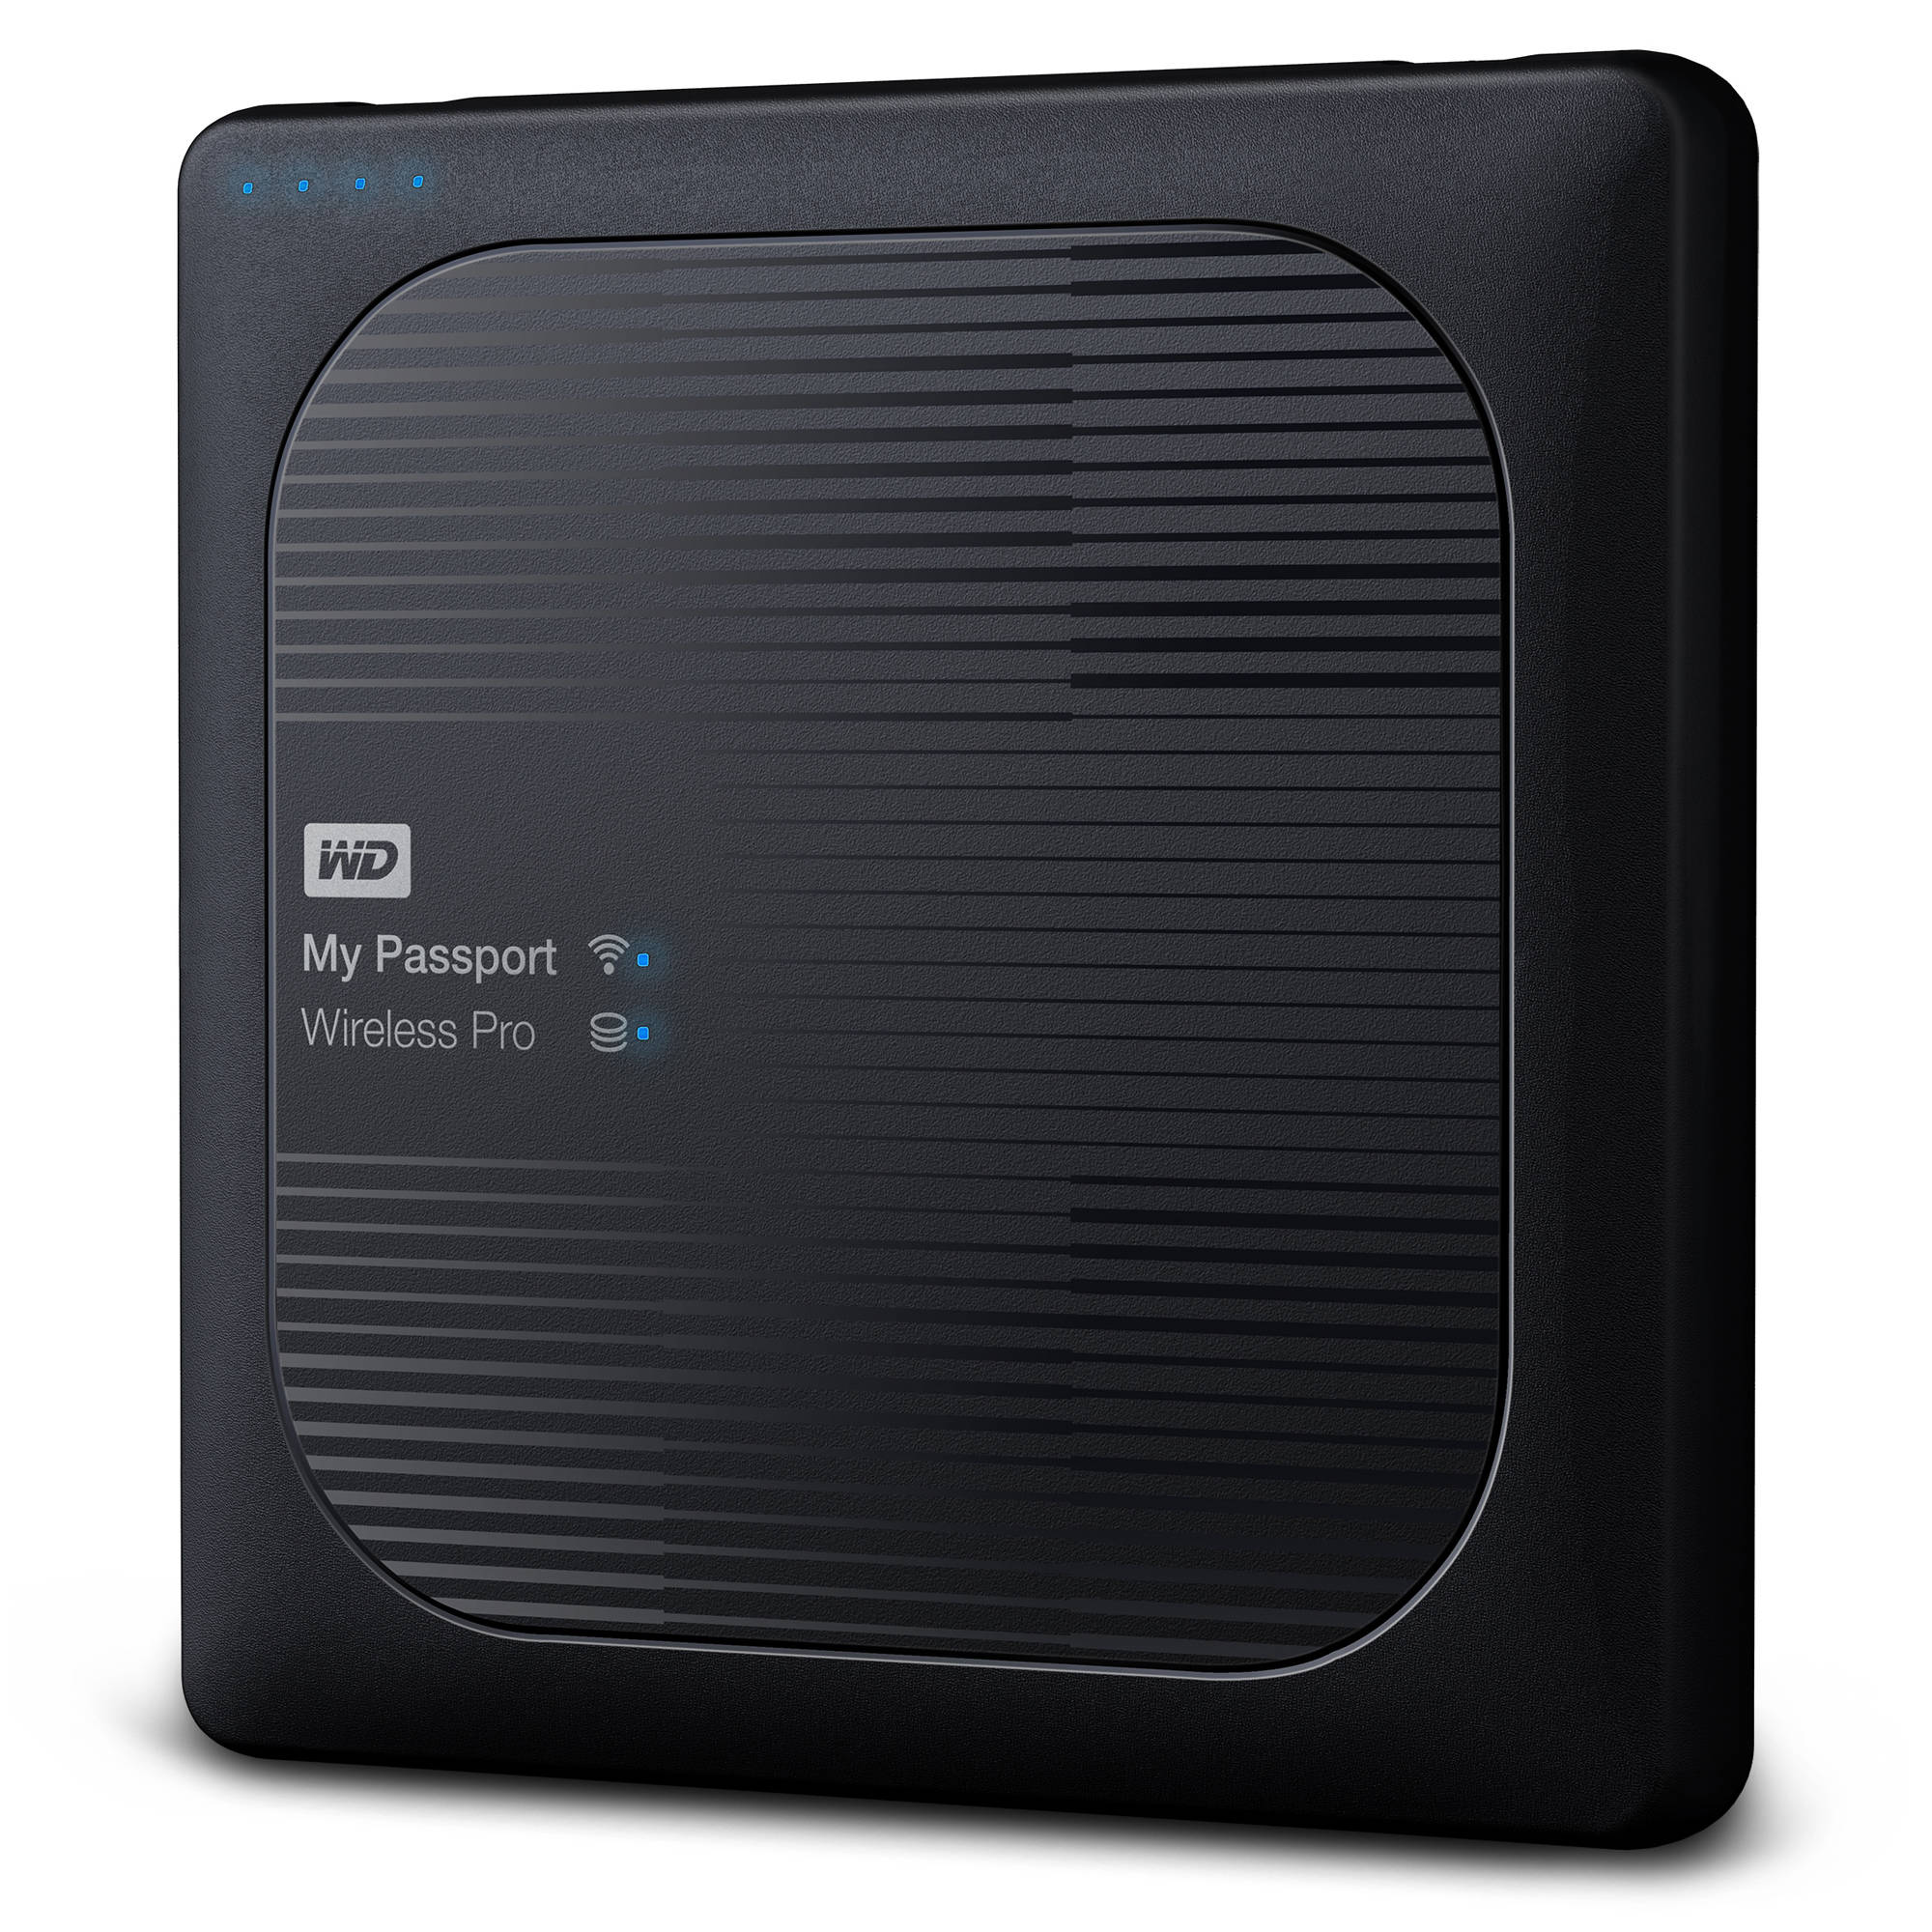 Wd 3tb my passport wireless pro usb 3 0 wdbsmt0030bbk nesn b h for 3tb esterno